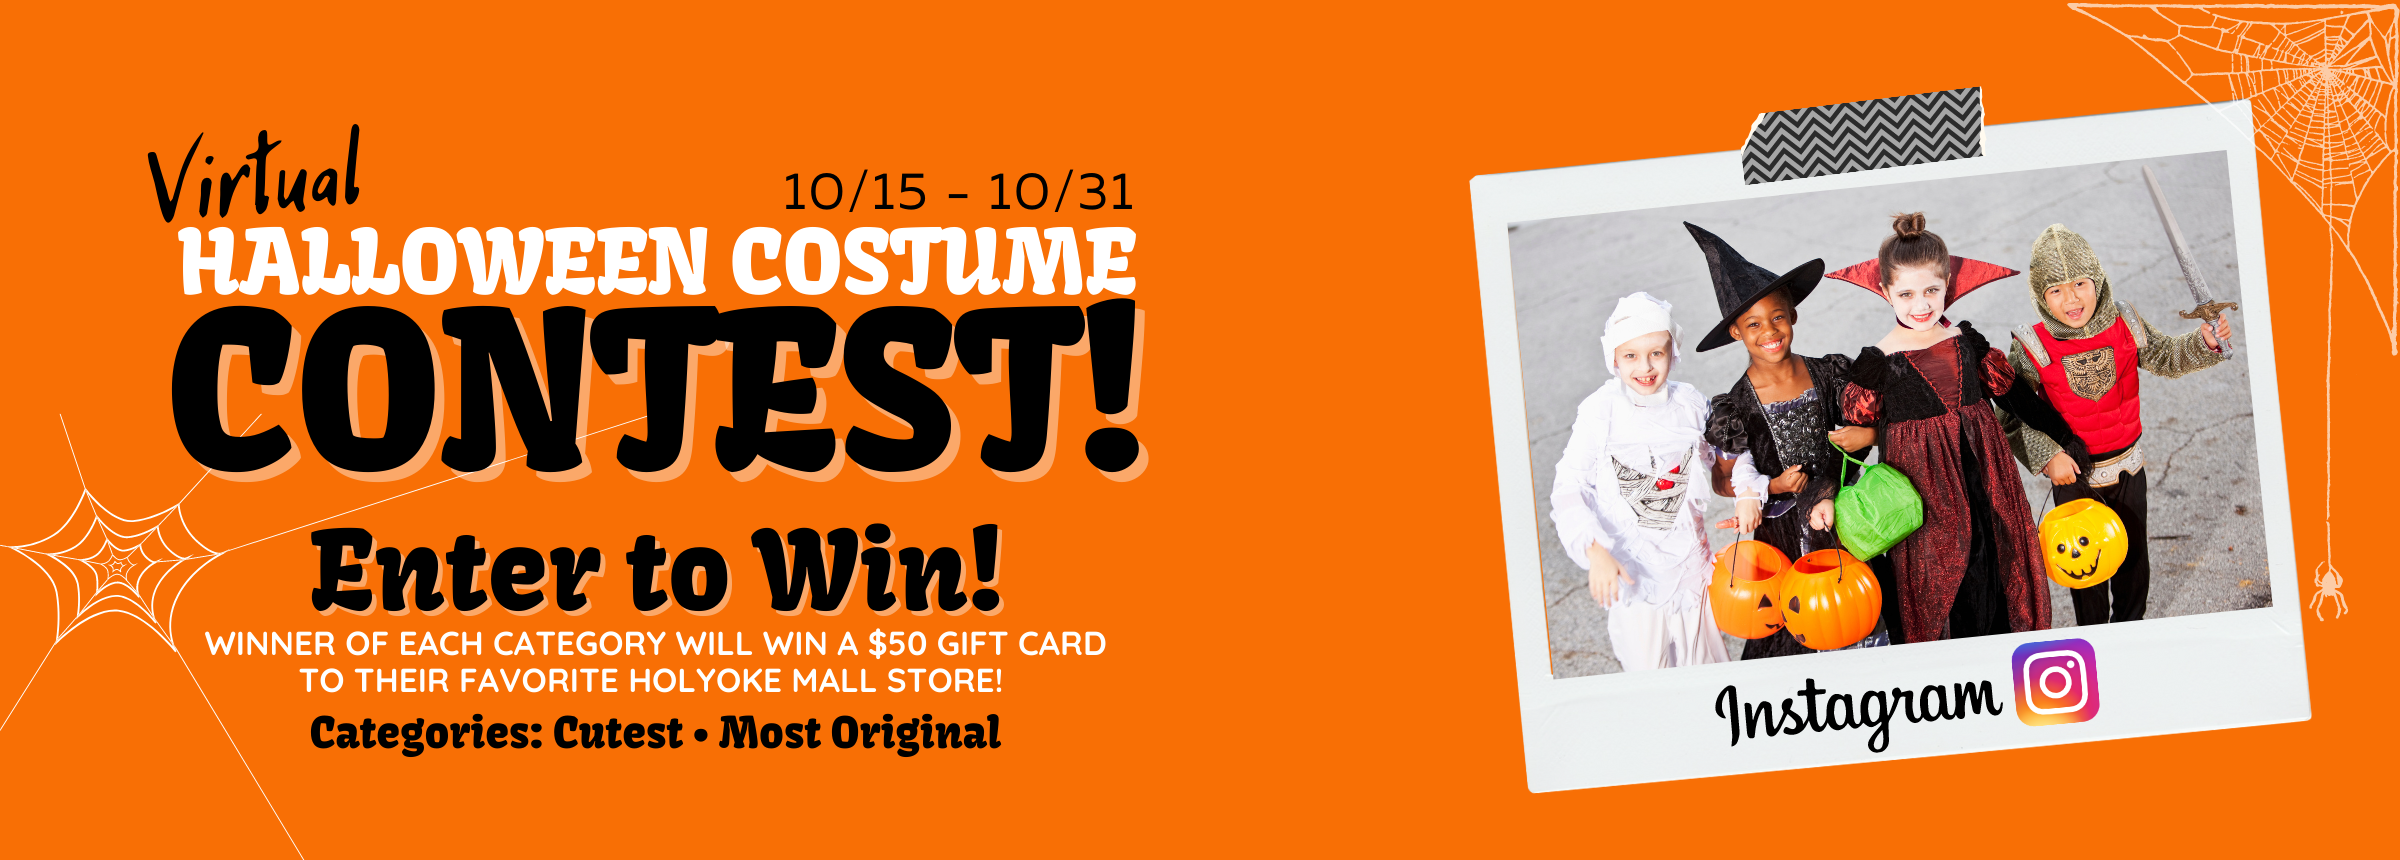 Costume Contest Blog Header